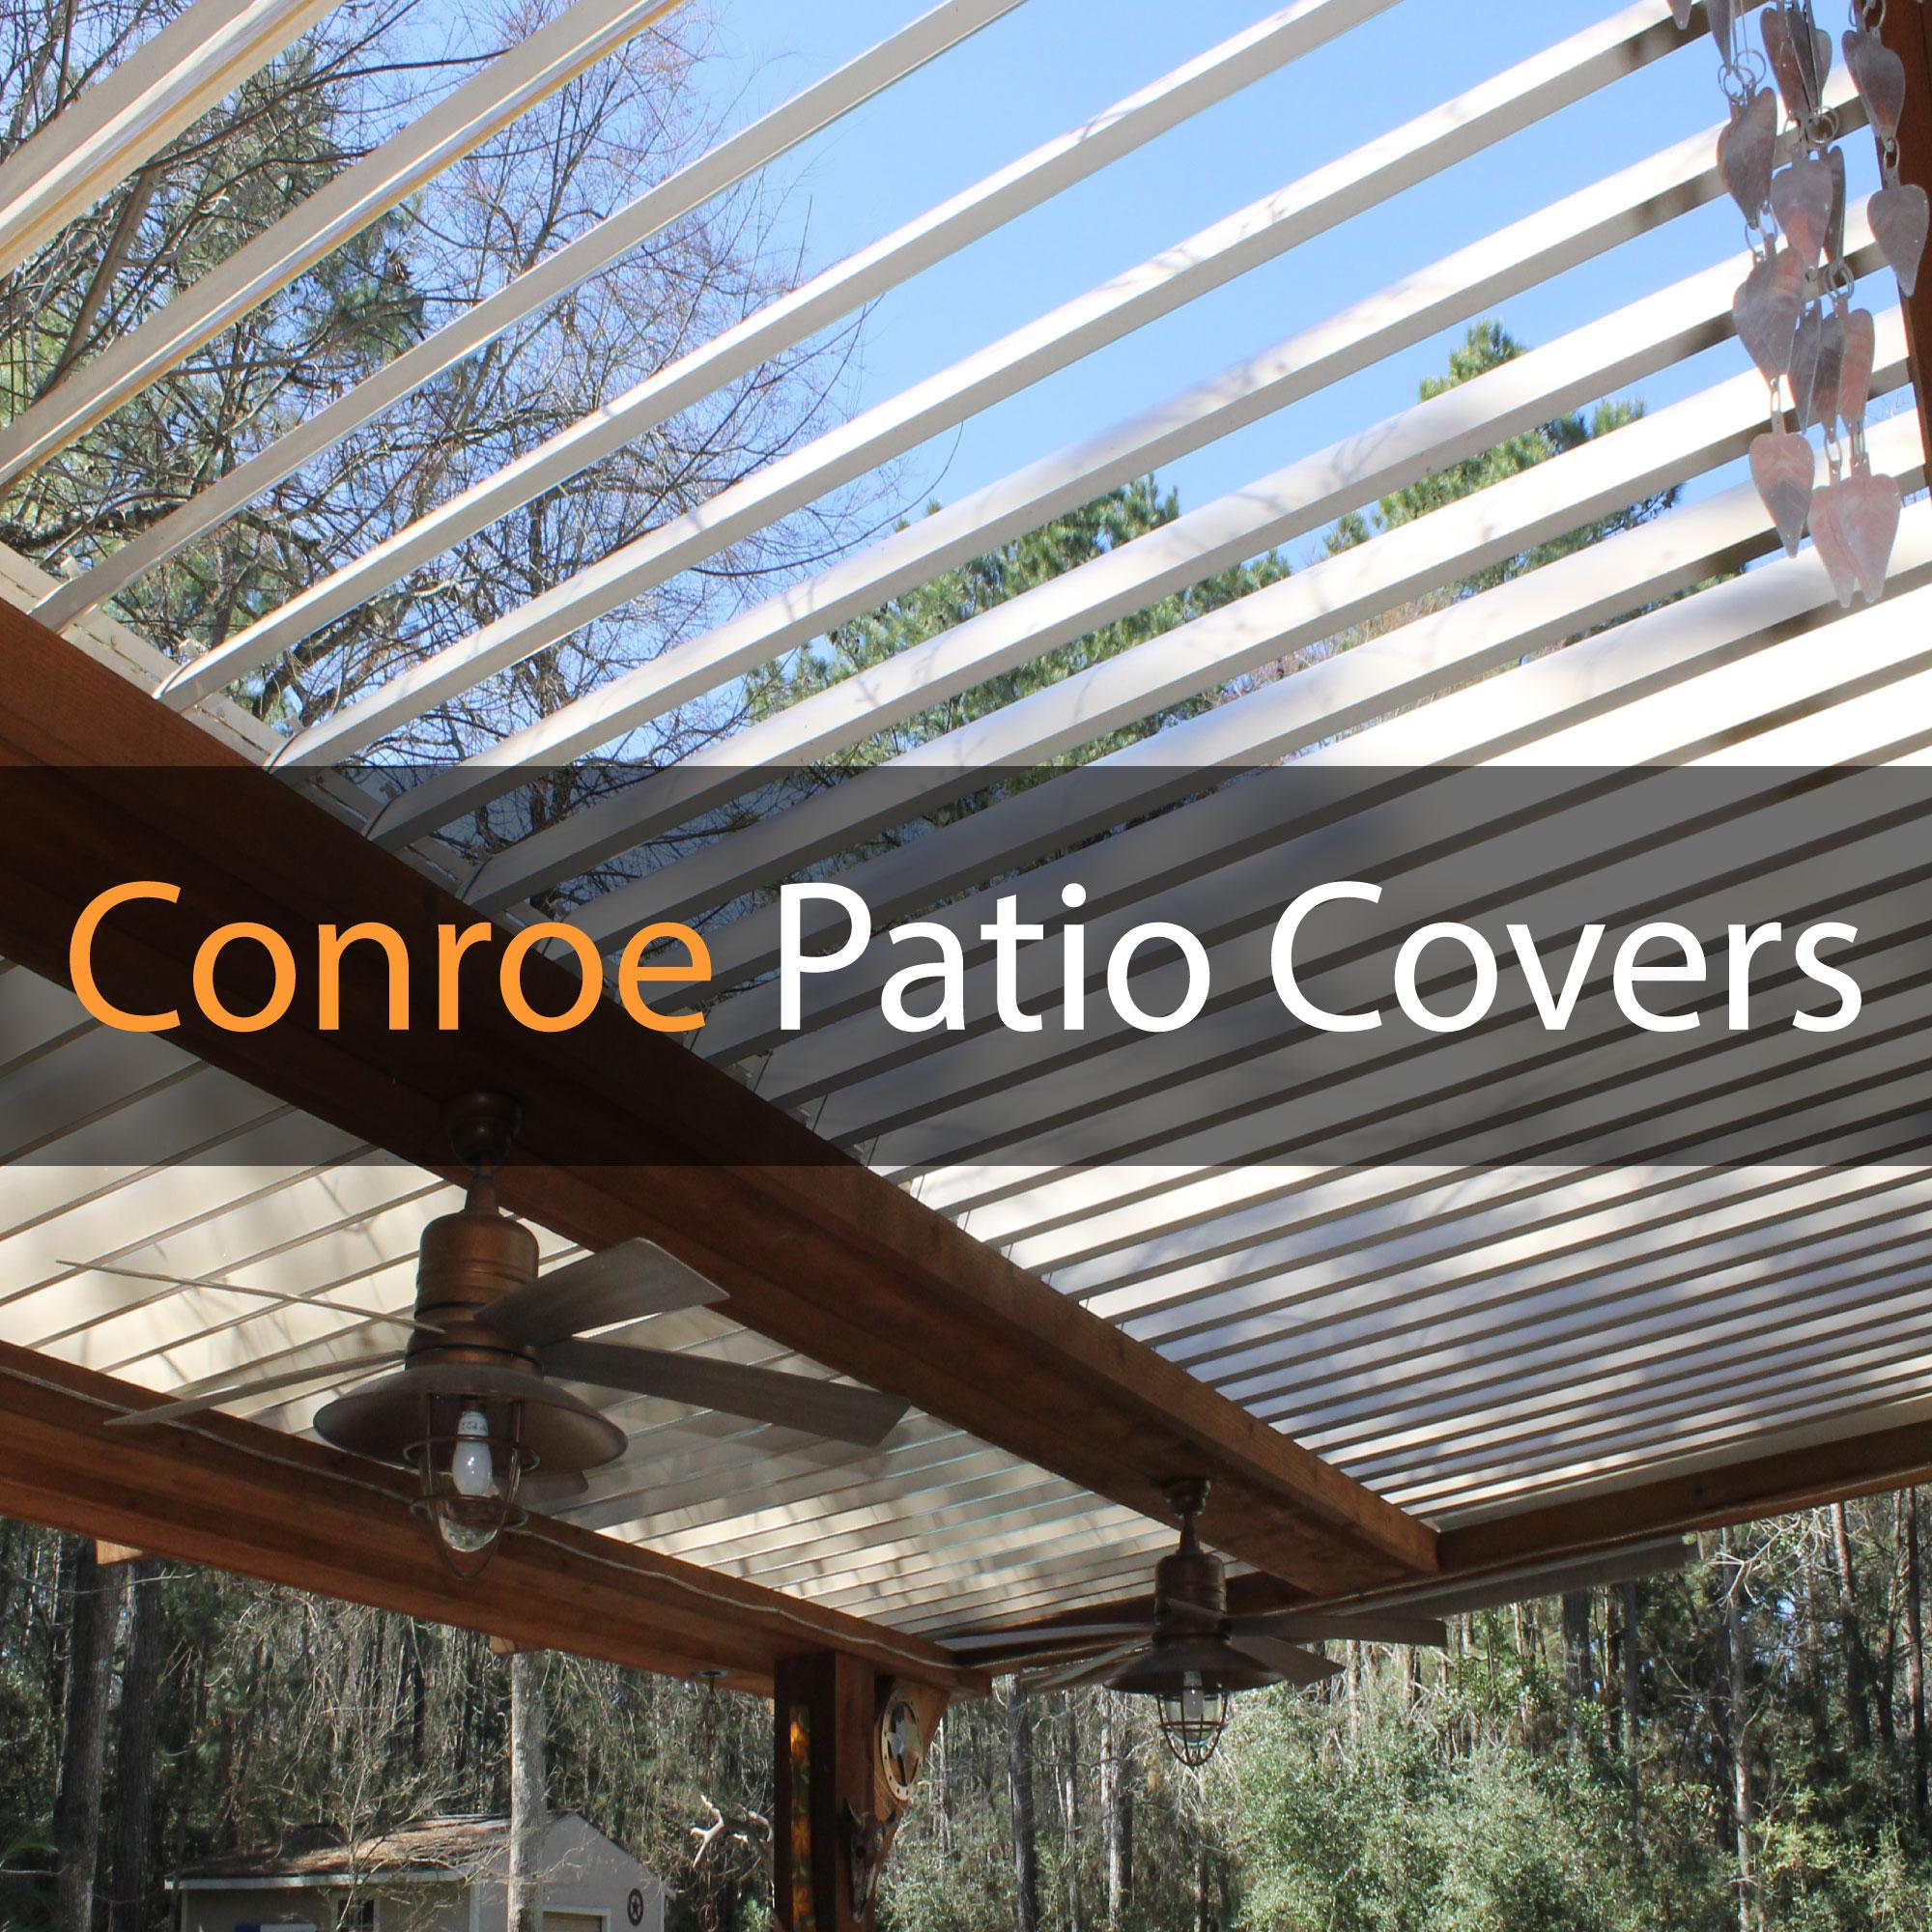 Conroe-Patio-Covers.jpg